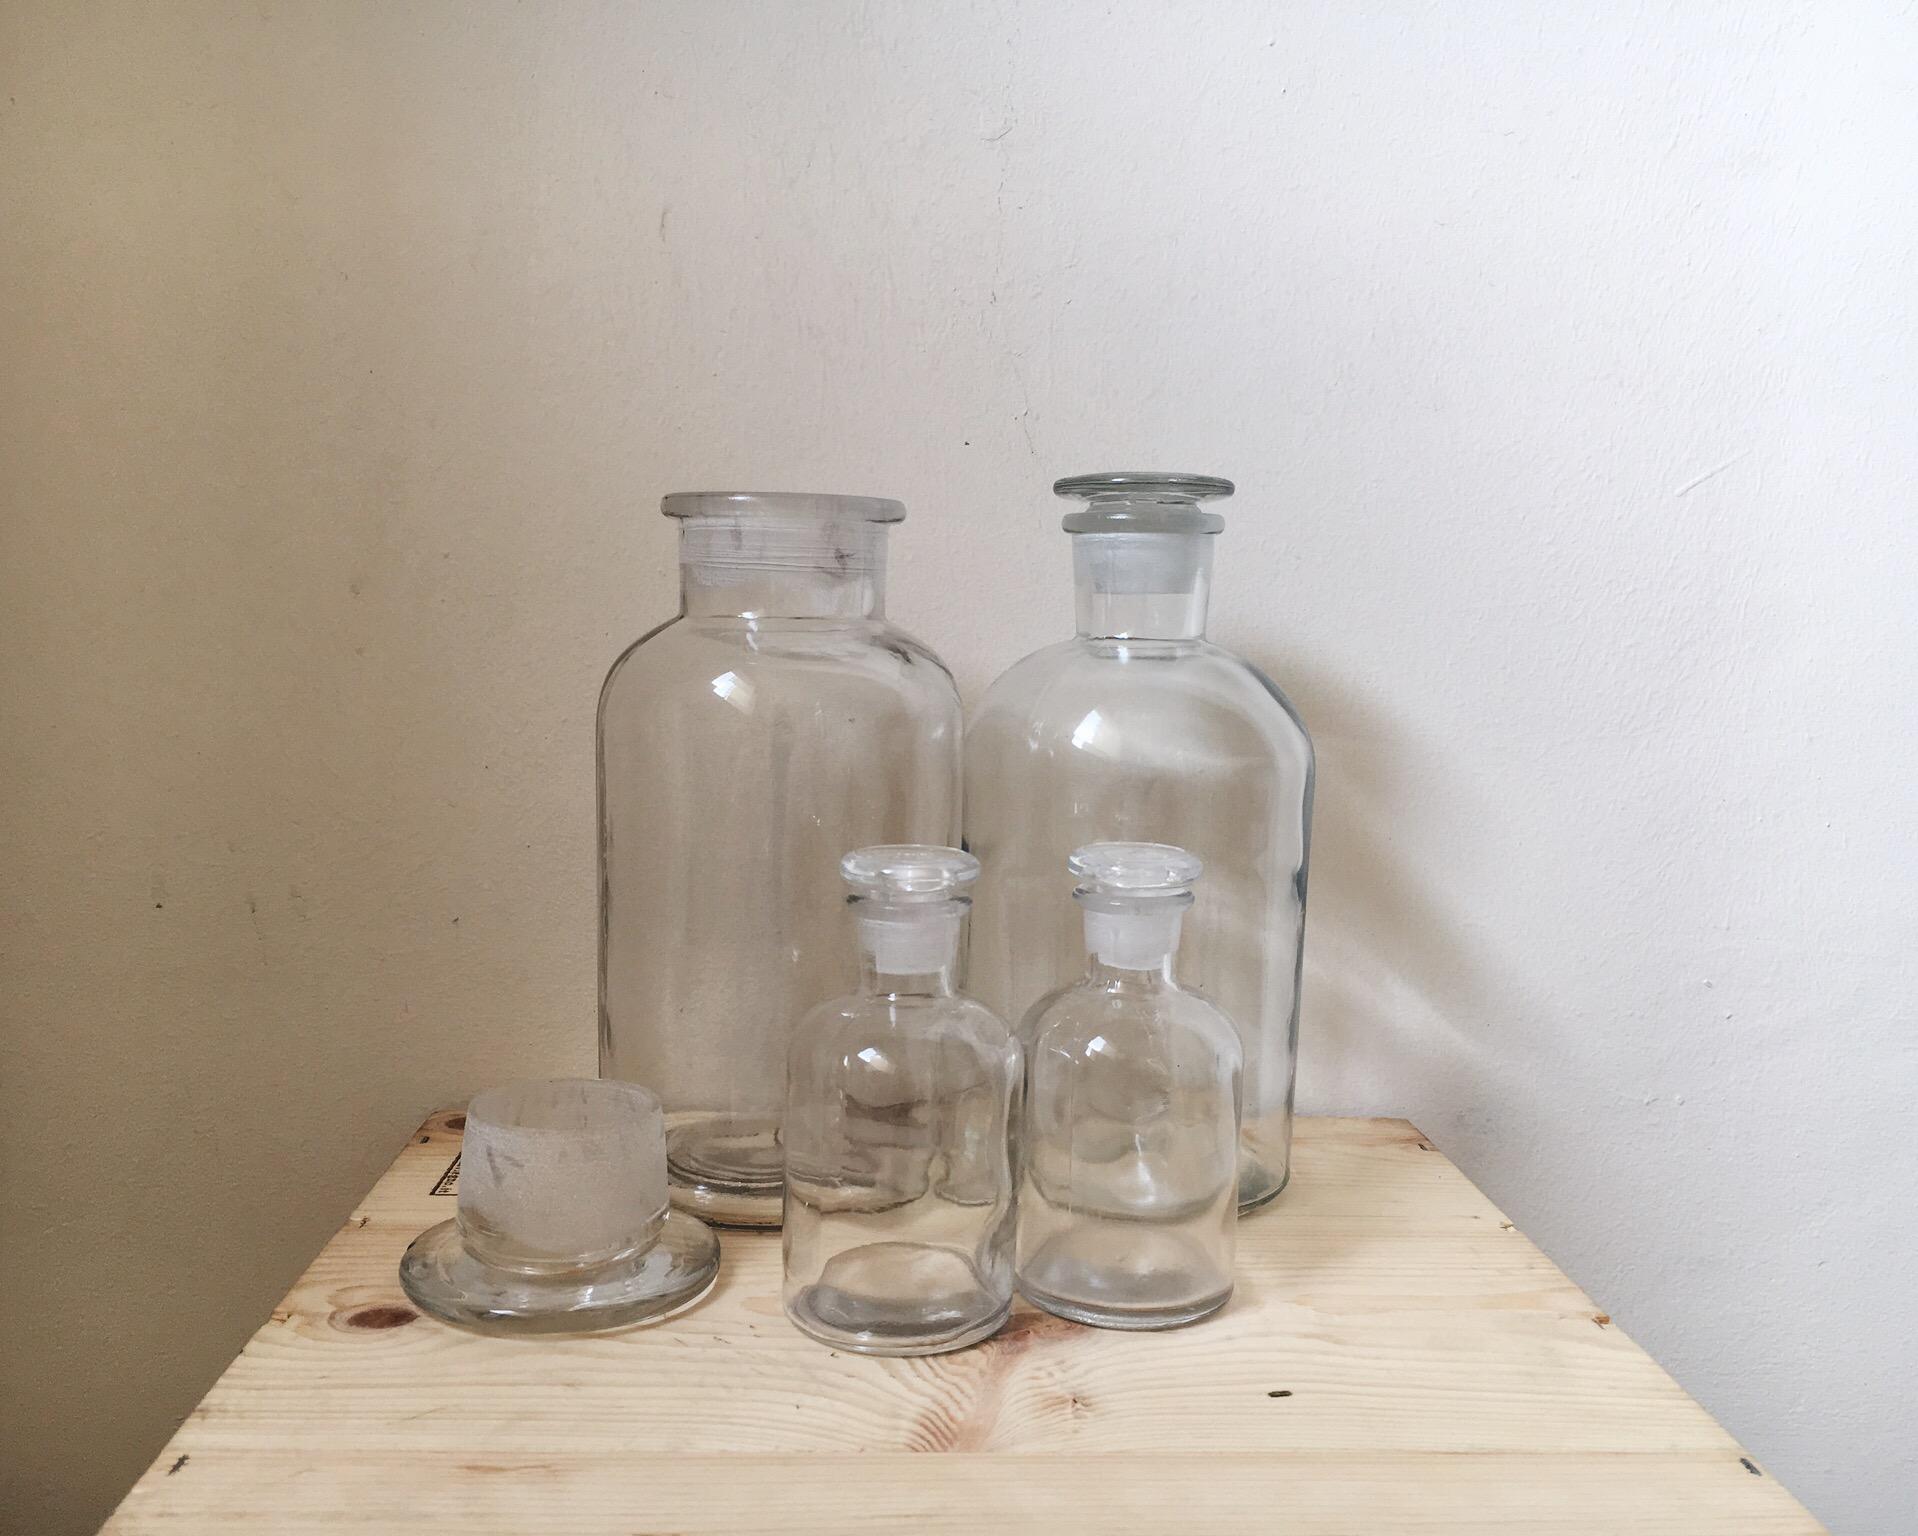 glassware apothecary bottles 4.JPG